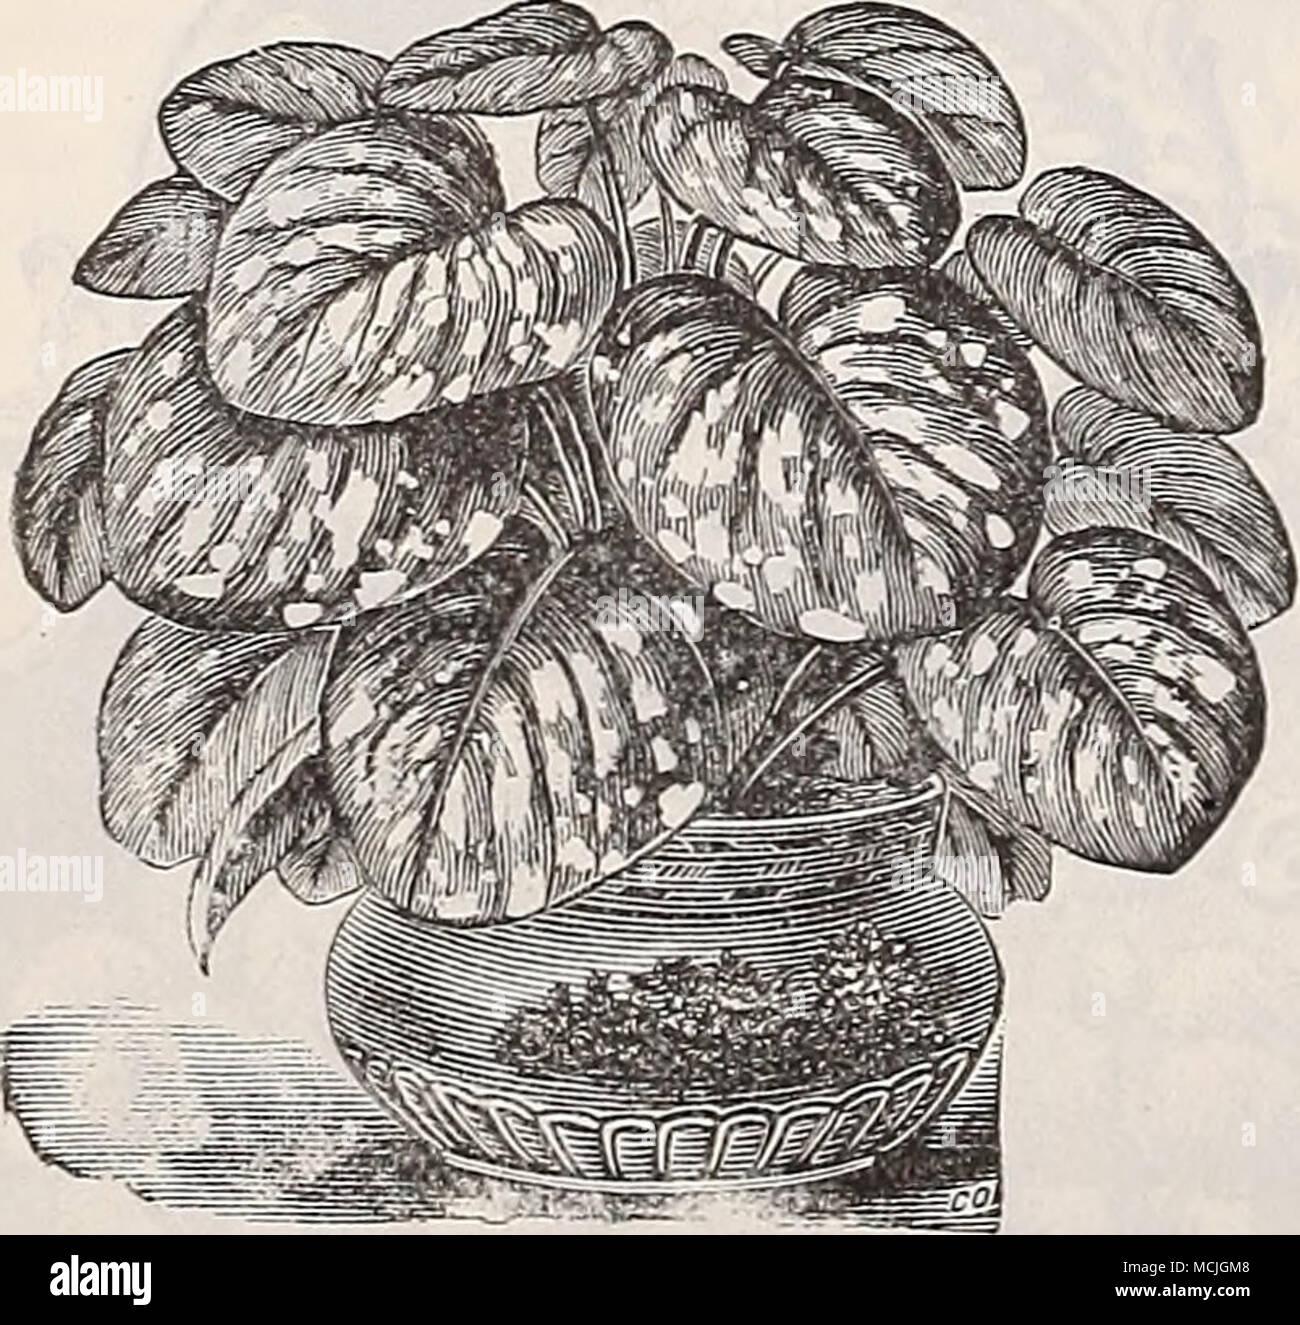 Gardenia Florida Cape Jessamine A Popular Well Known Plant With